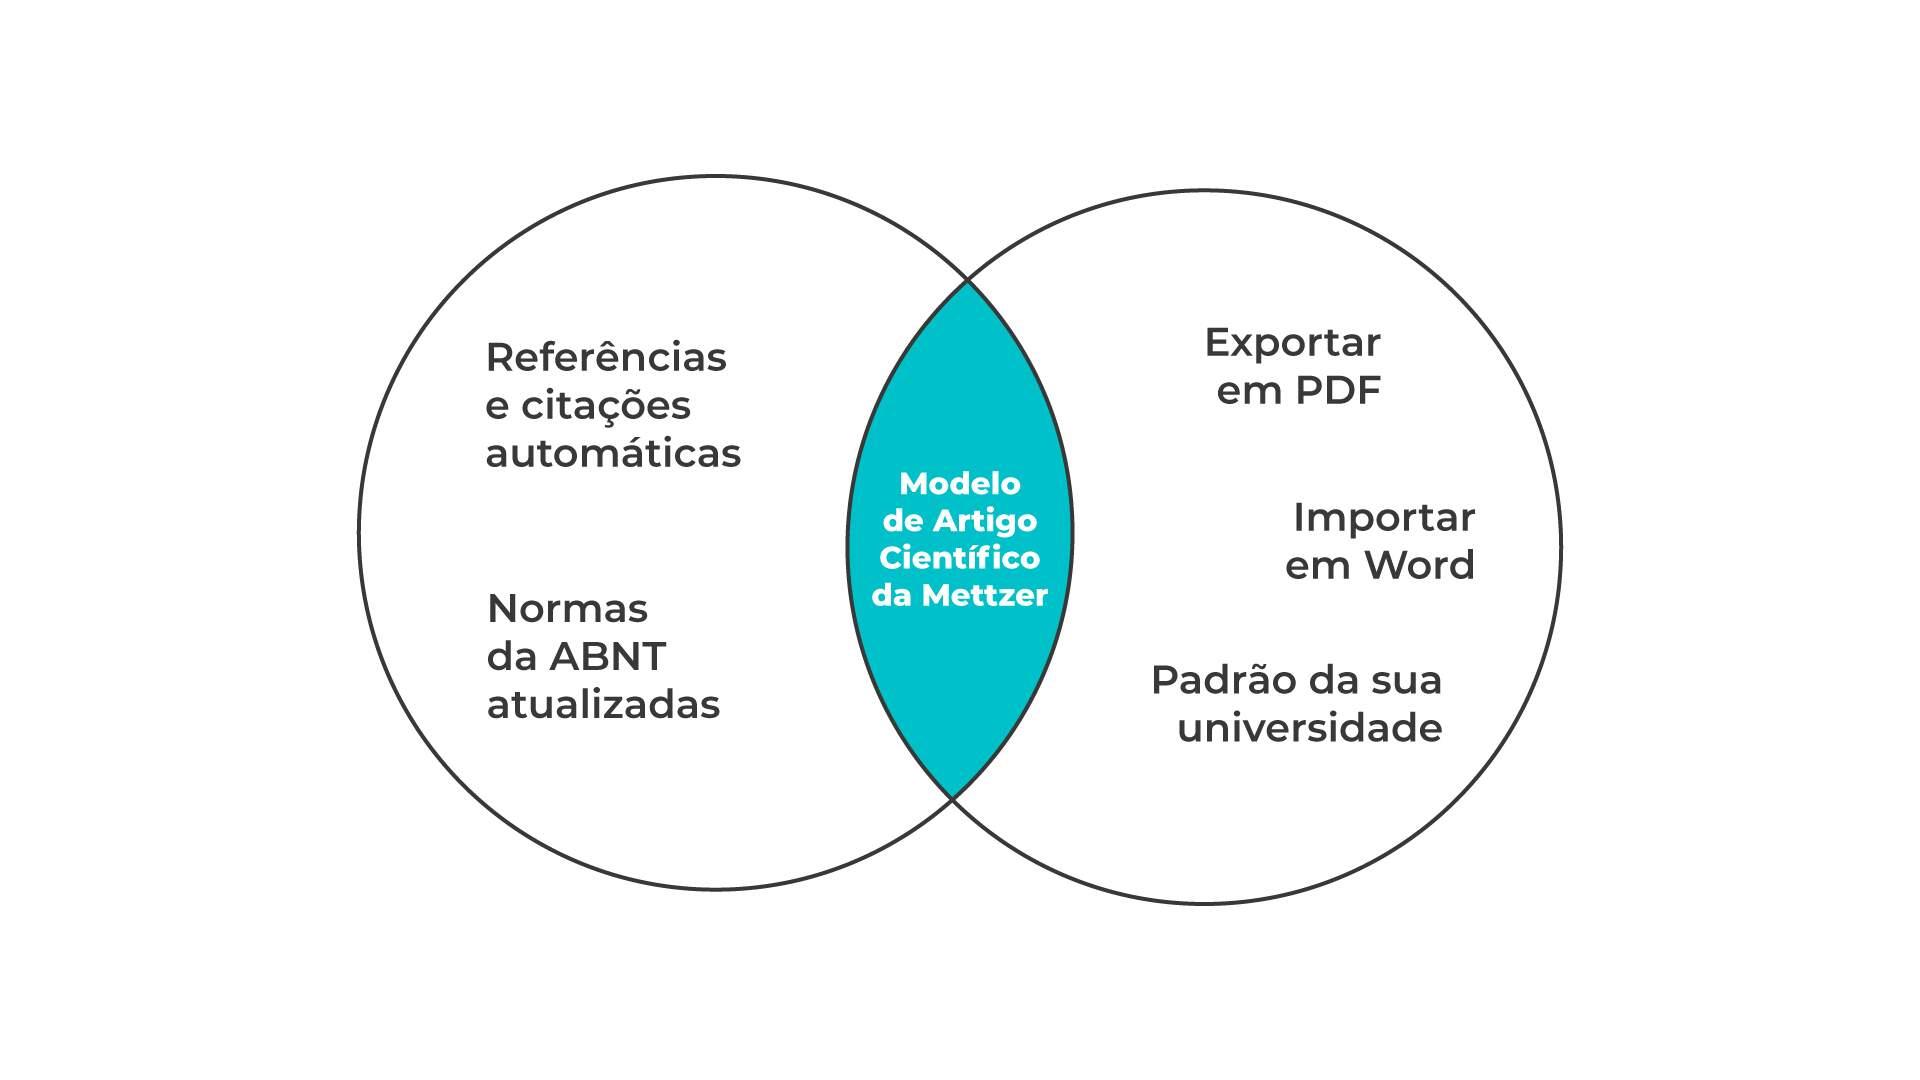 modelo-de-Artigo-Científico-mettzer